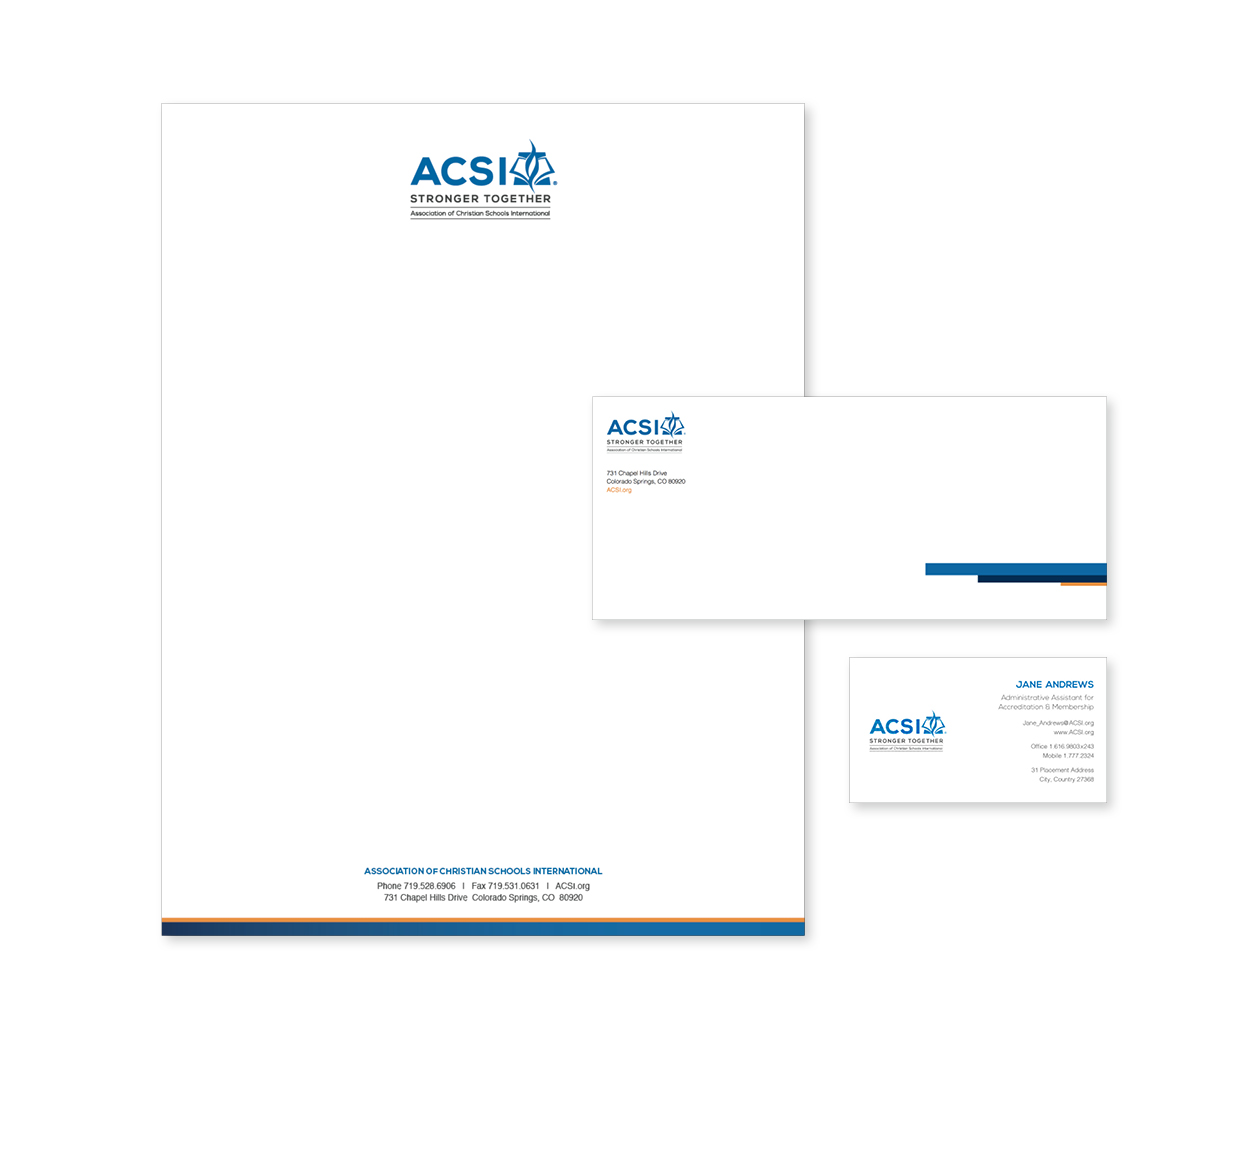 CaseStudy_ACSI10.jpg